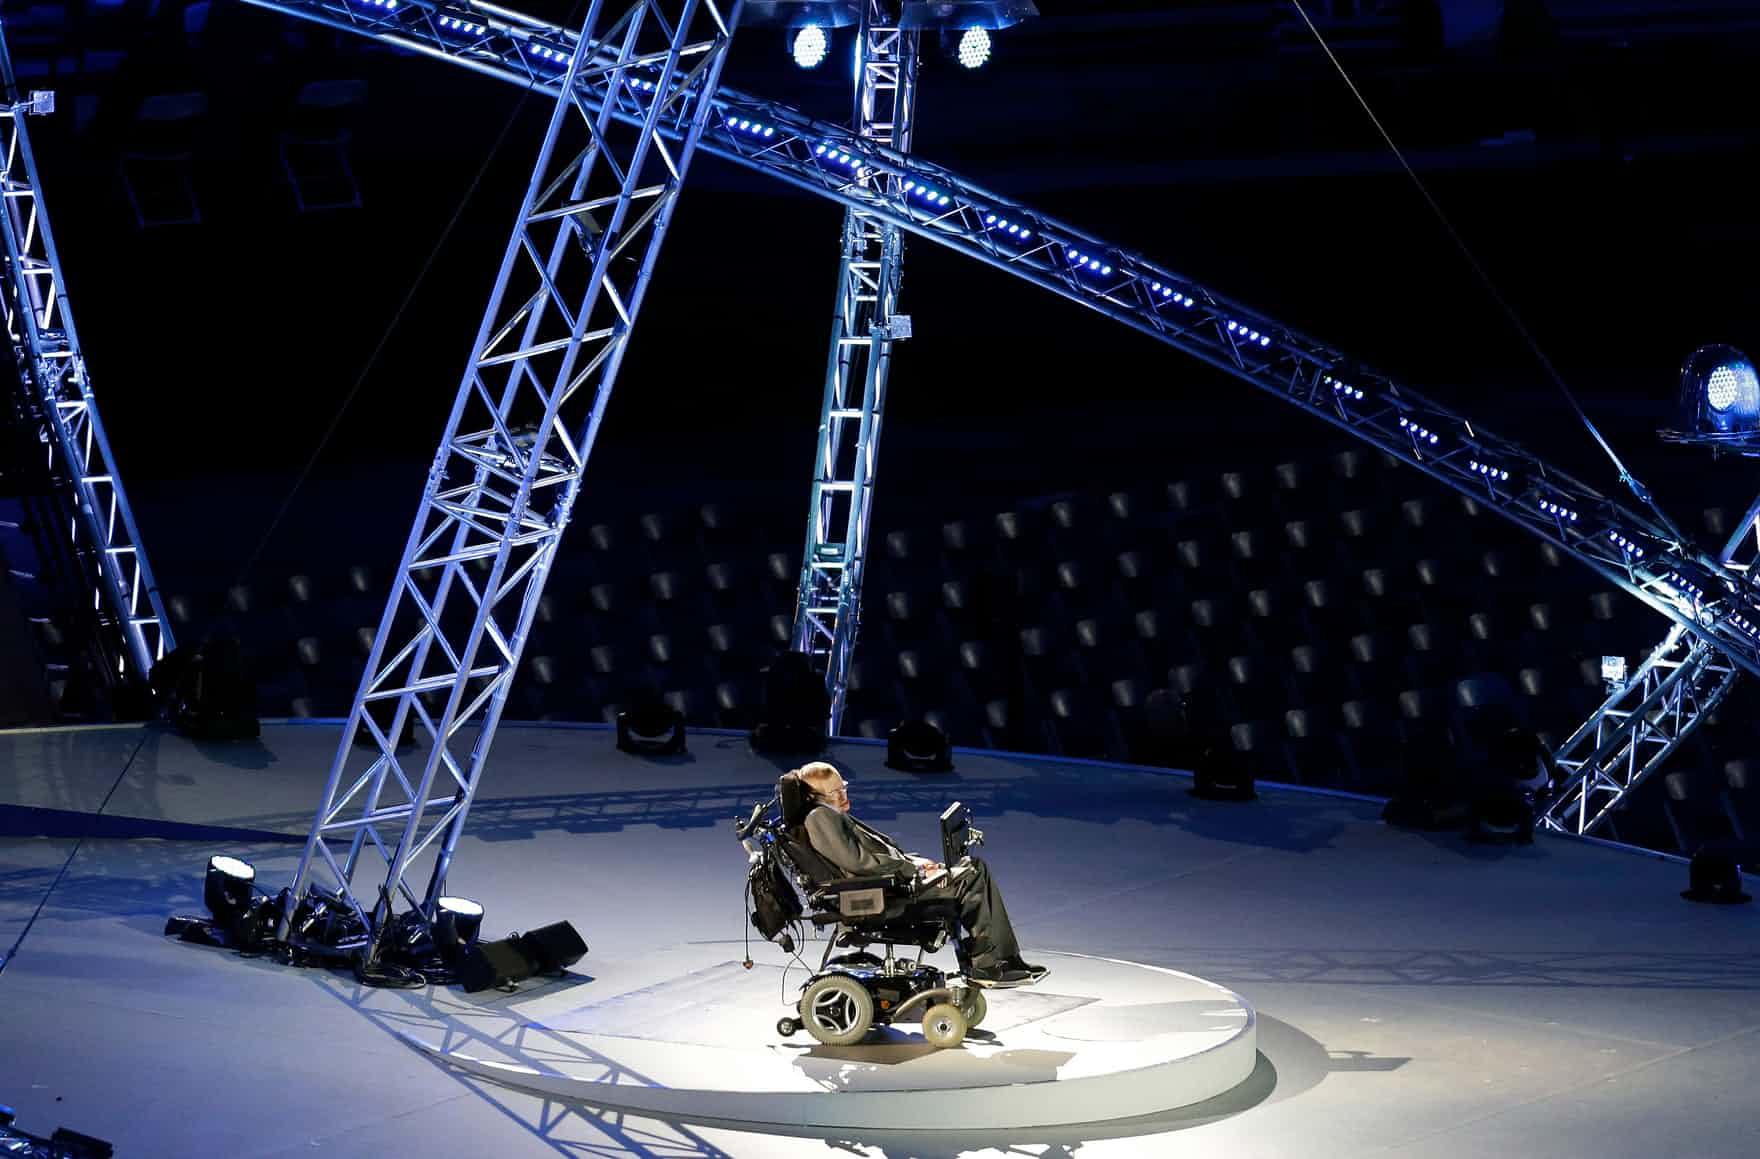 Stephen Hawking 14 -elleman